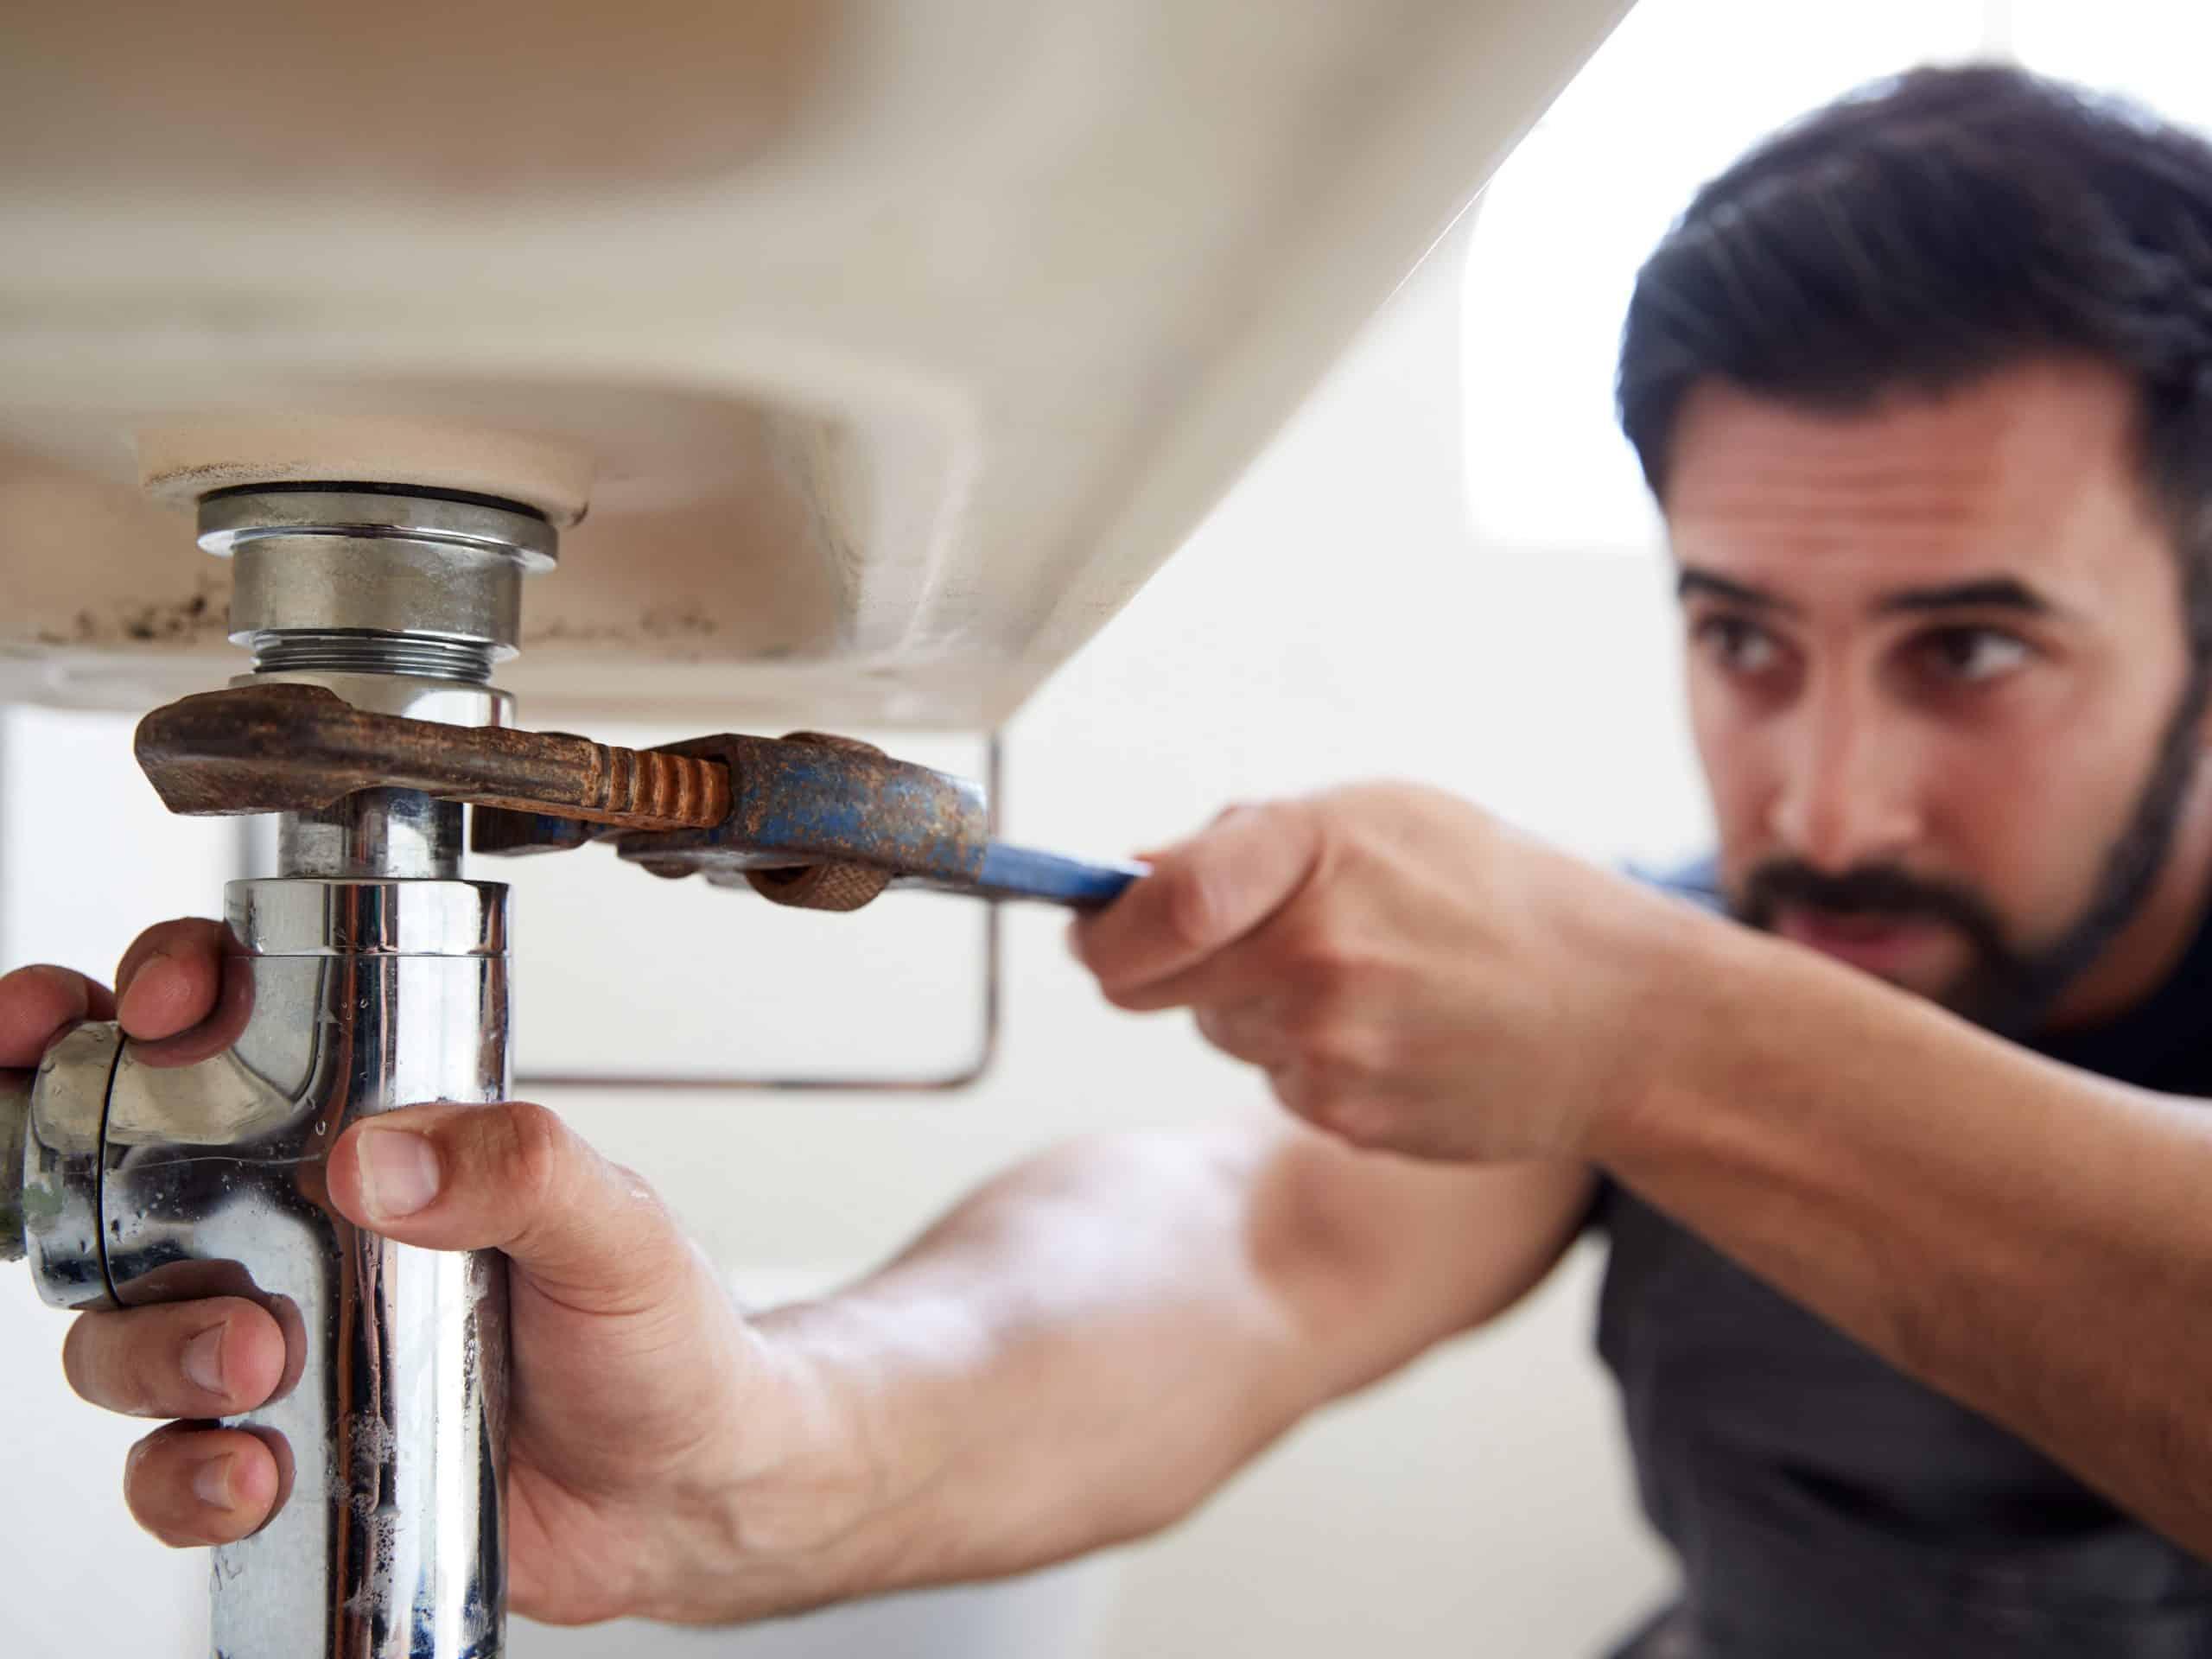 plumbing service profesional fixing sink